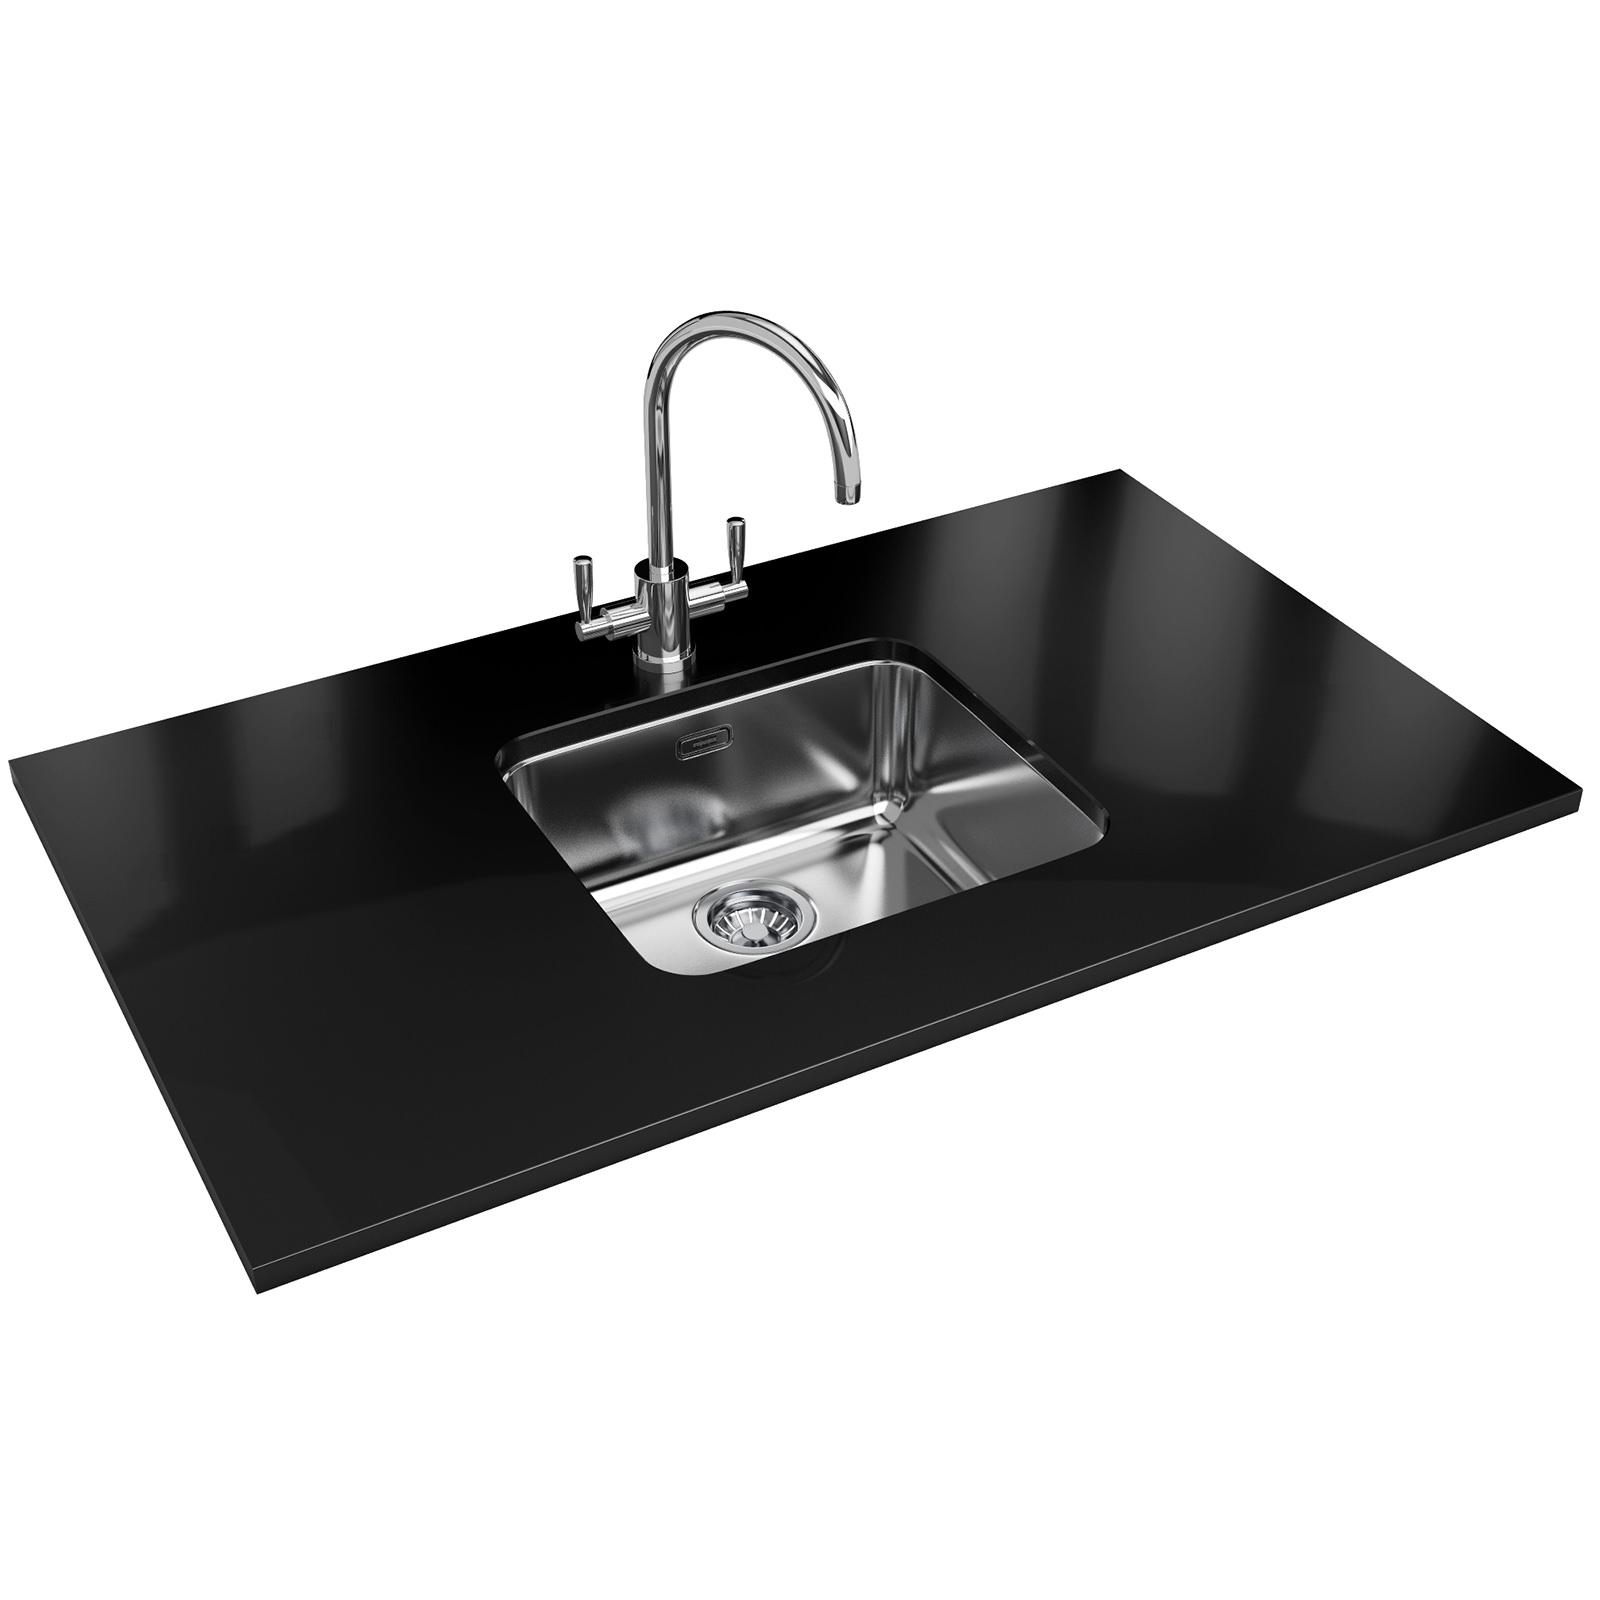 Franke Largo Lax 110 45 Designer Pack Stainless Steel Sink